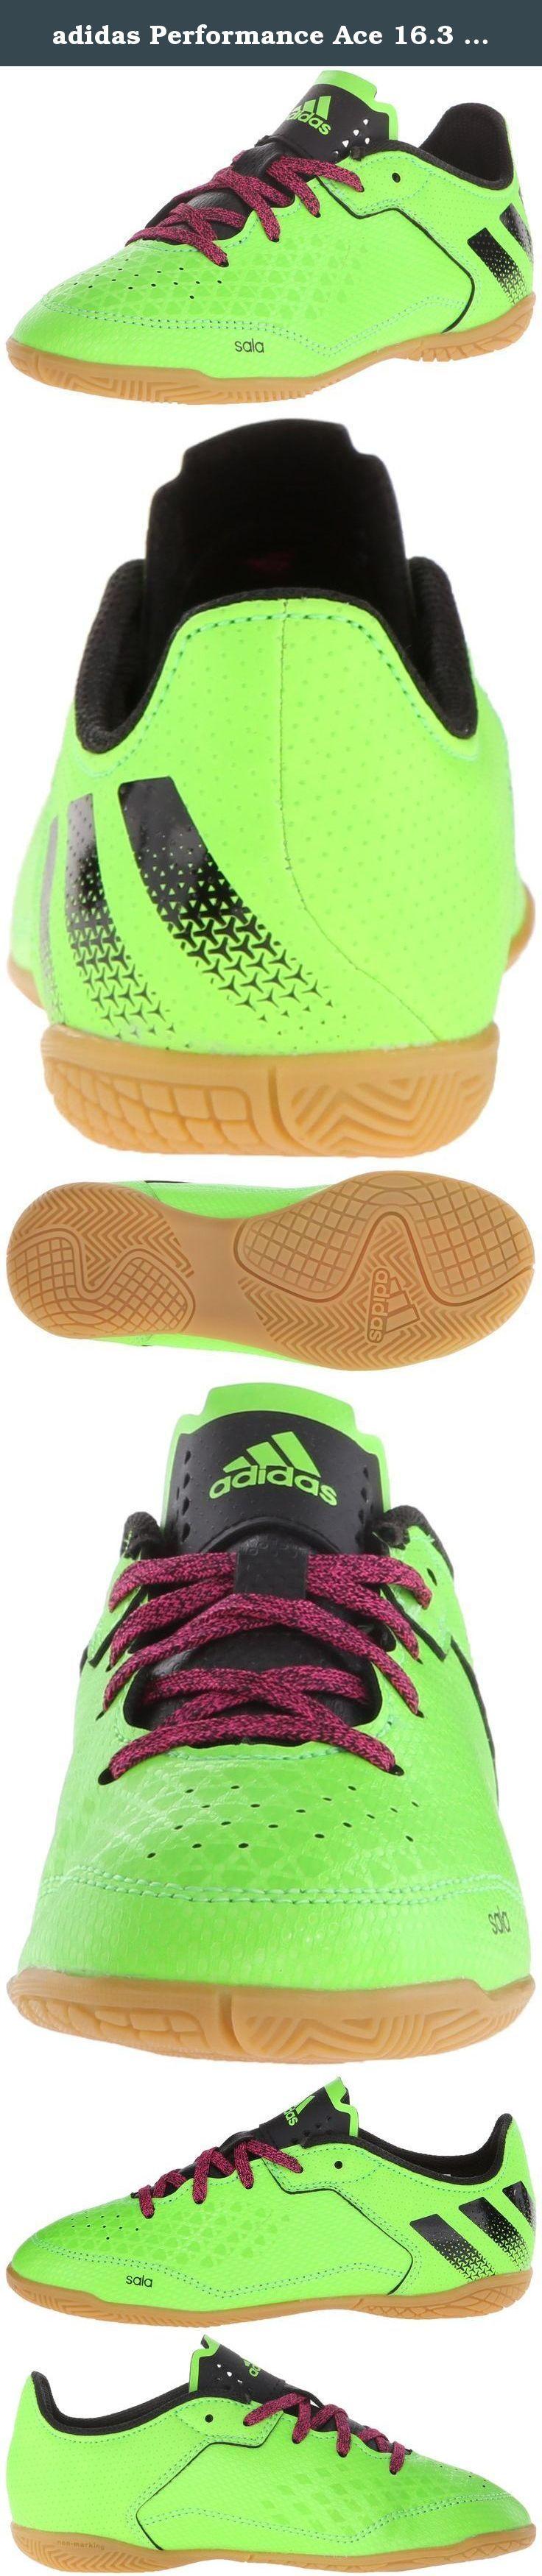 adidas Performance Ace 16.3 CT J Soccer Shoe (Toddler/Little Kid/Big Kid), Green/Black/Shock Pink, 4.5 M US Big Kid. Kids Soccer Shoe.